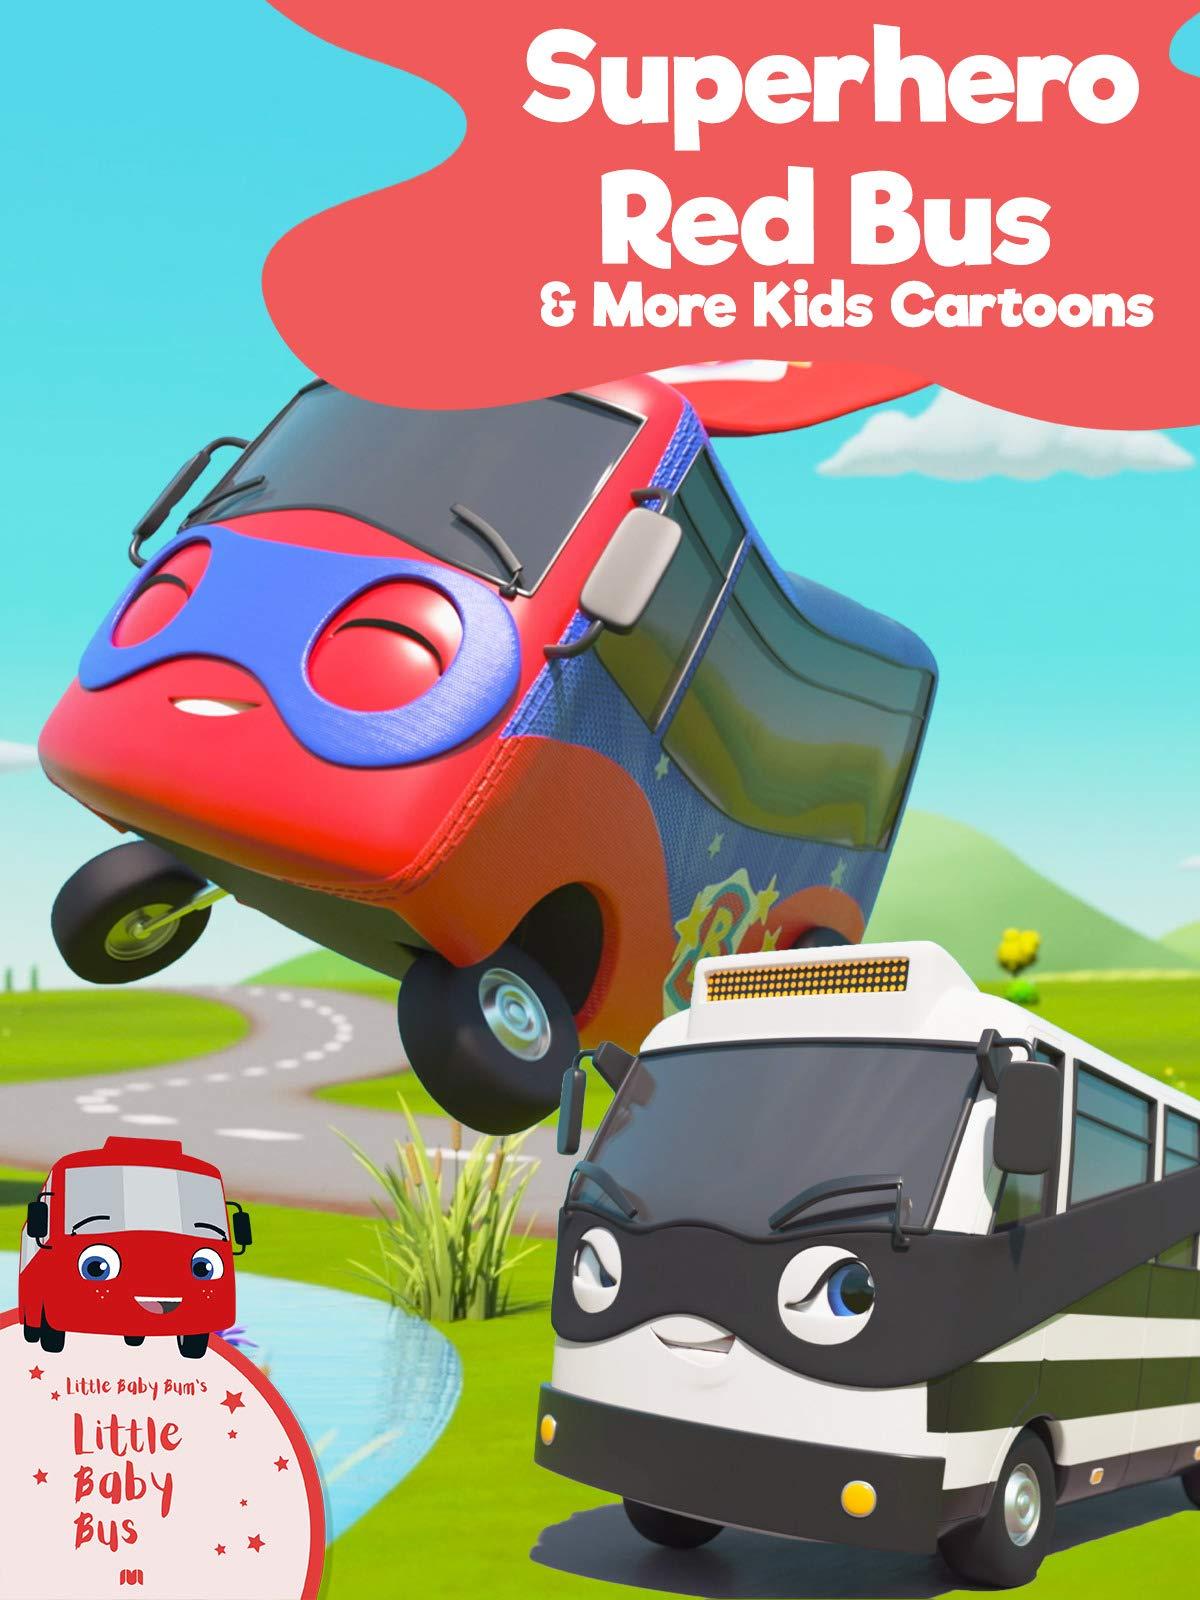 Little Baby Bus - Superhero Red Bus & More Kids Cartoons